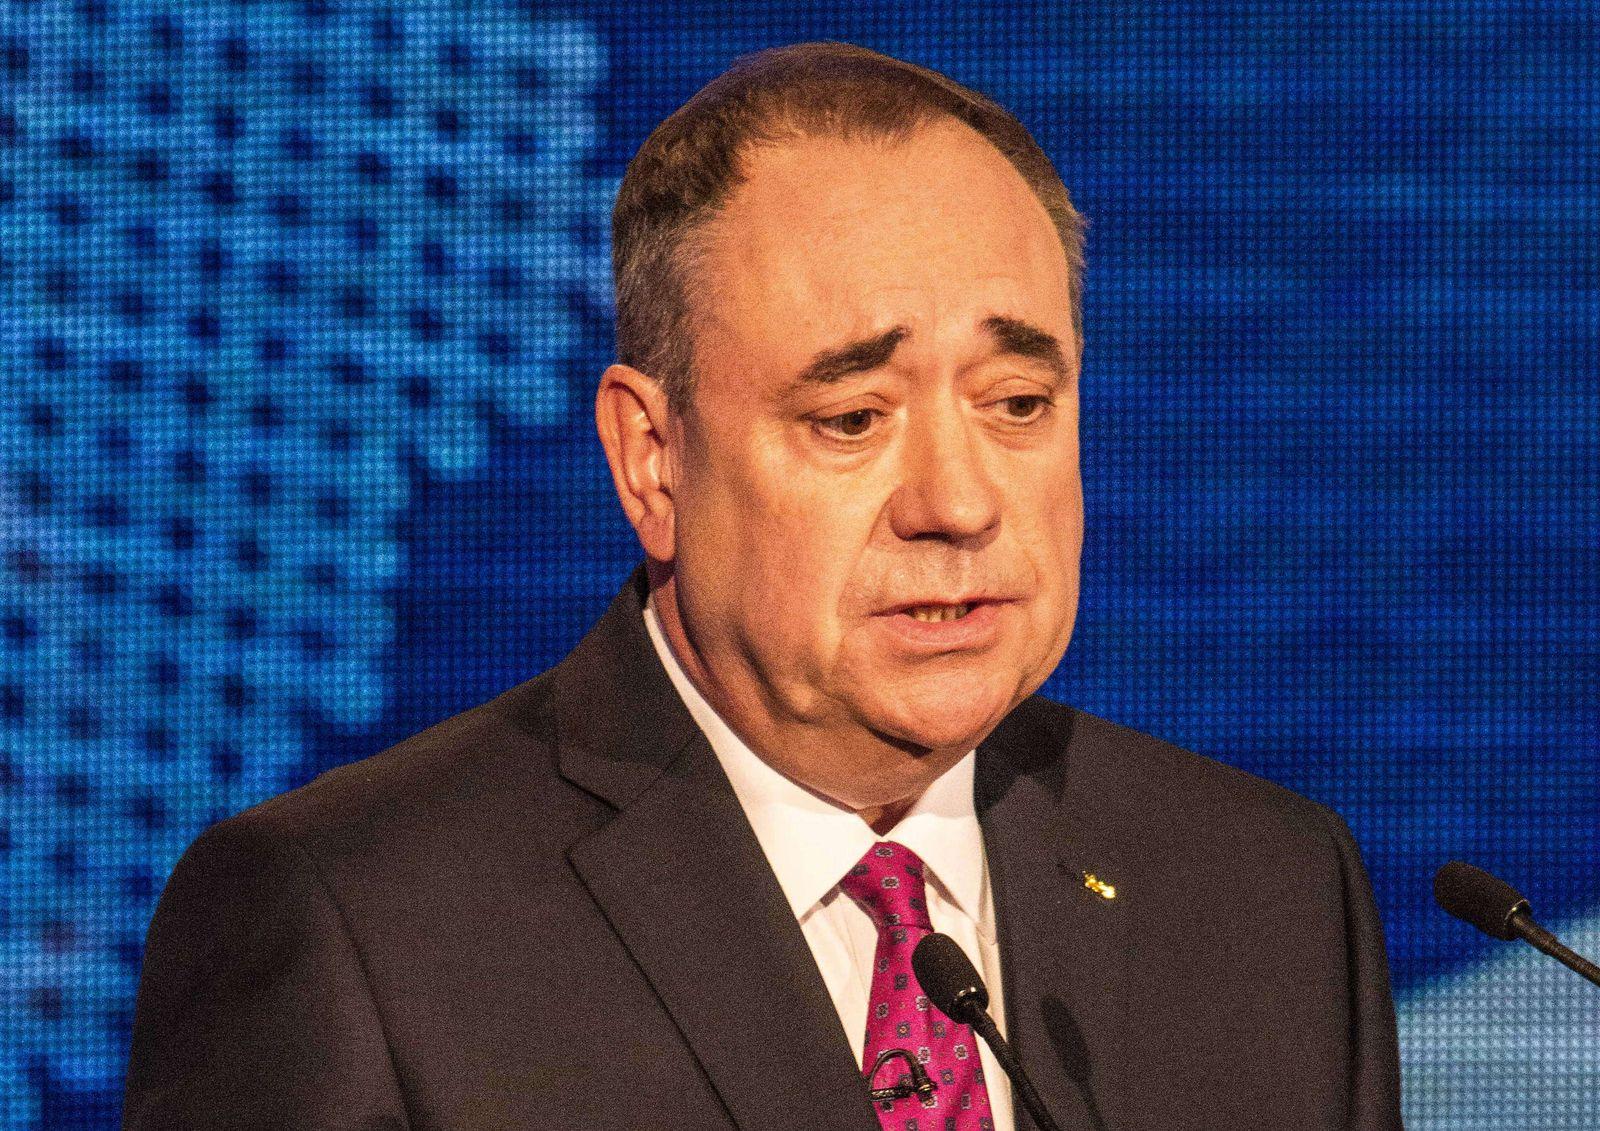 BRITAIN-SCOTLAND-POLITICS-VOTE-MEDIA